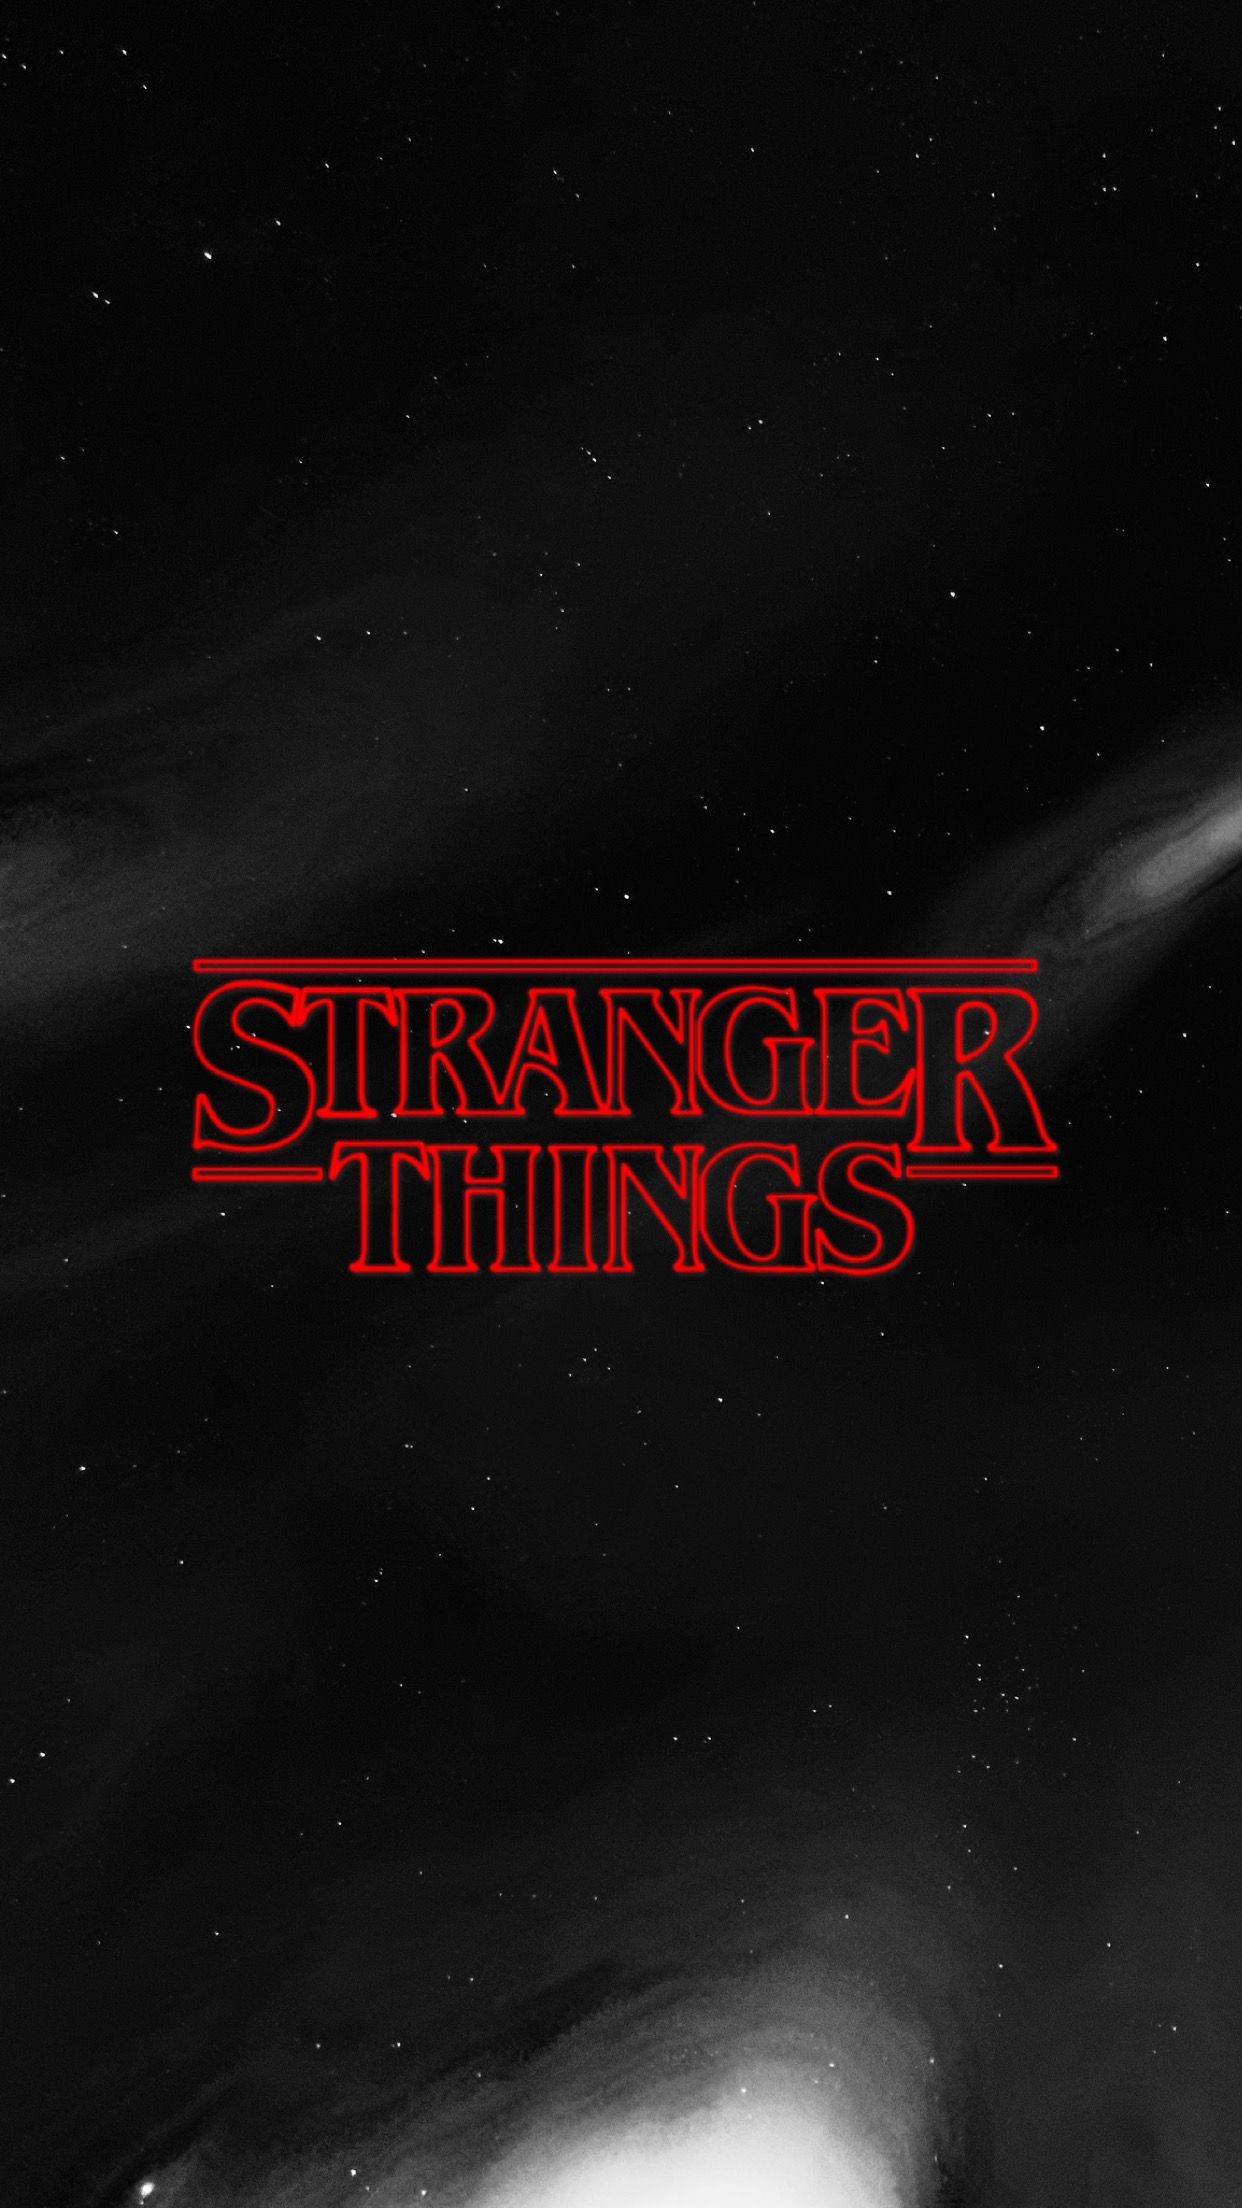 Pin De Missobray04 Em Stranger Things Em 2020 Papel De Parede Vaporwave Papel De Parede Diferente Ideias De Papel De Parede